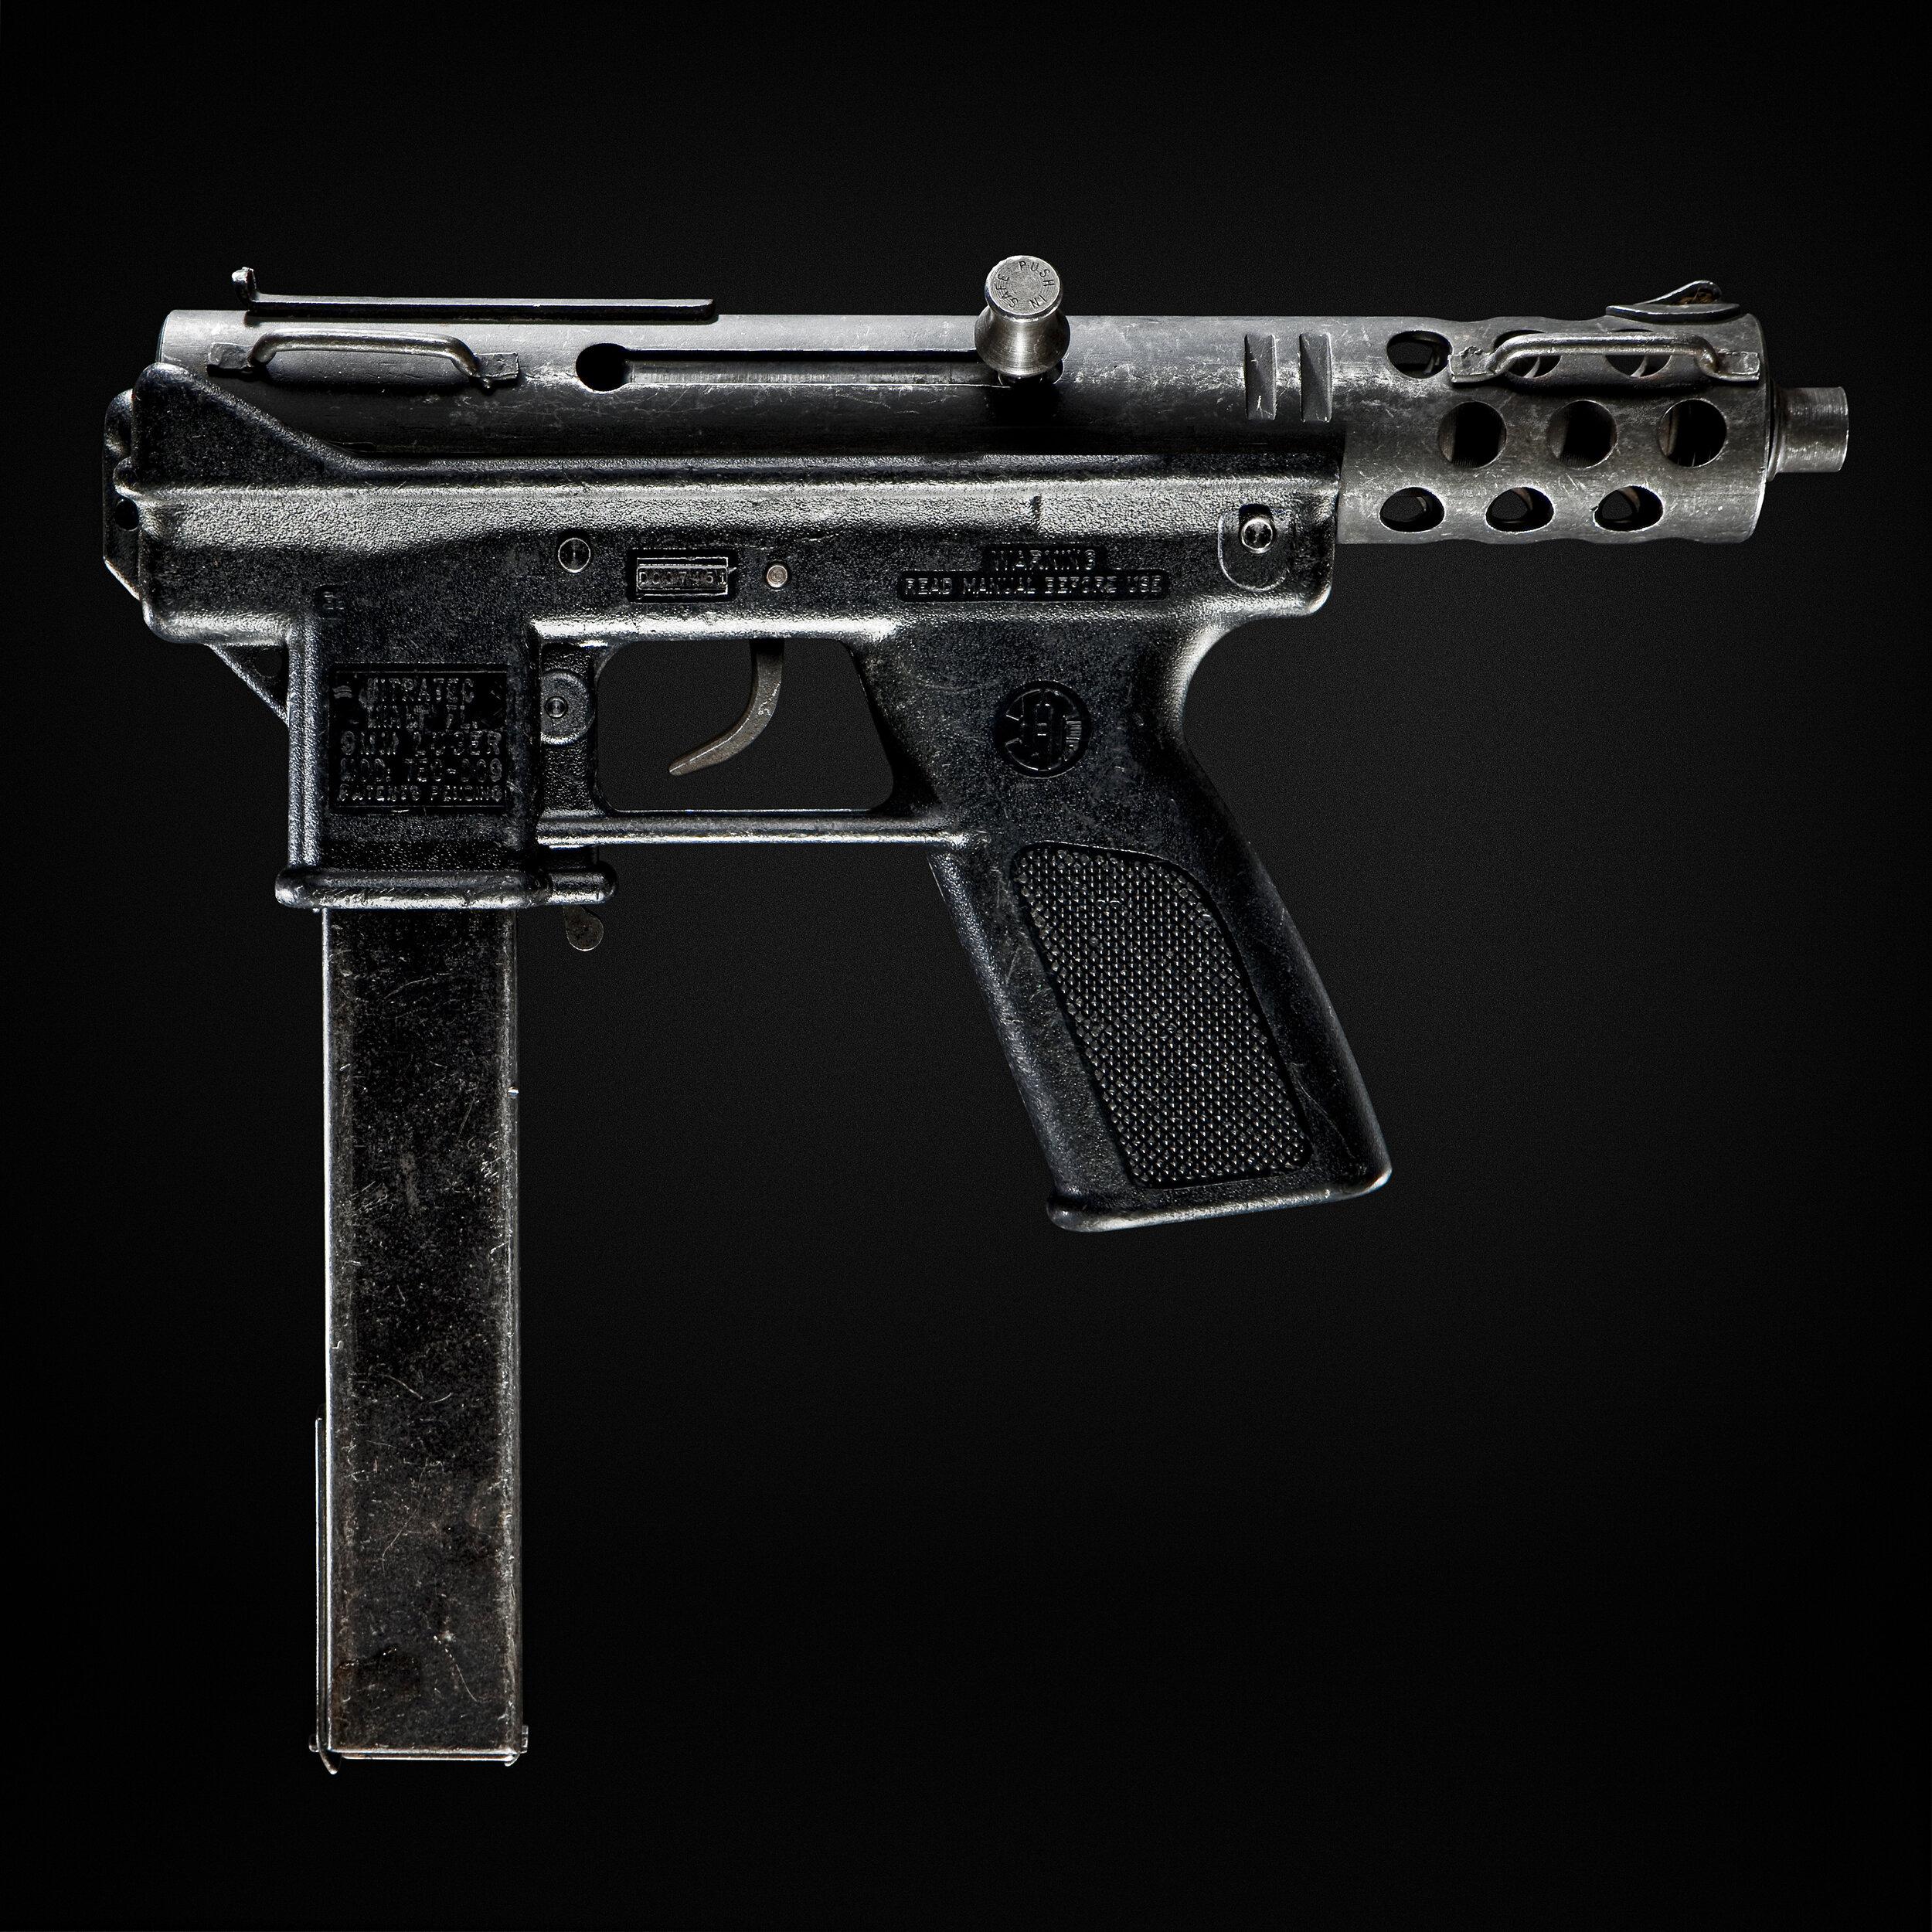 RW_Guns_3211_master.jpg